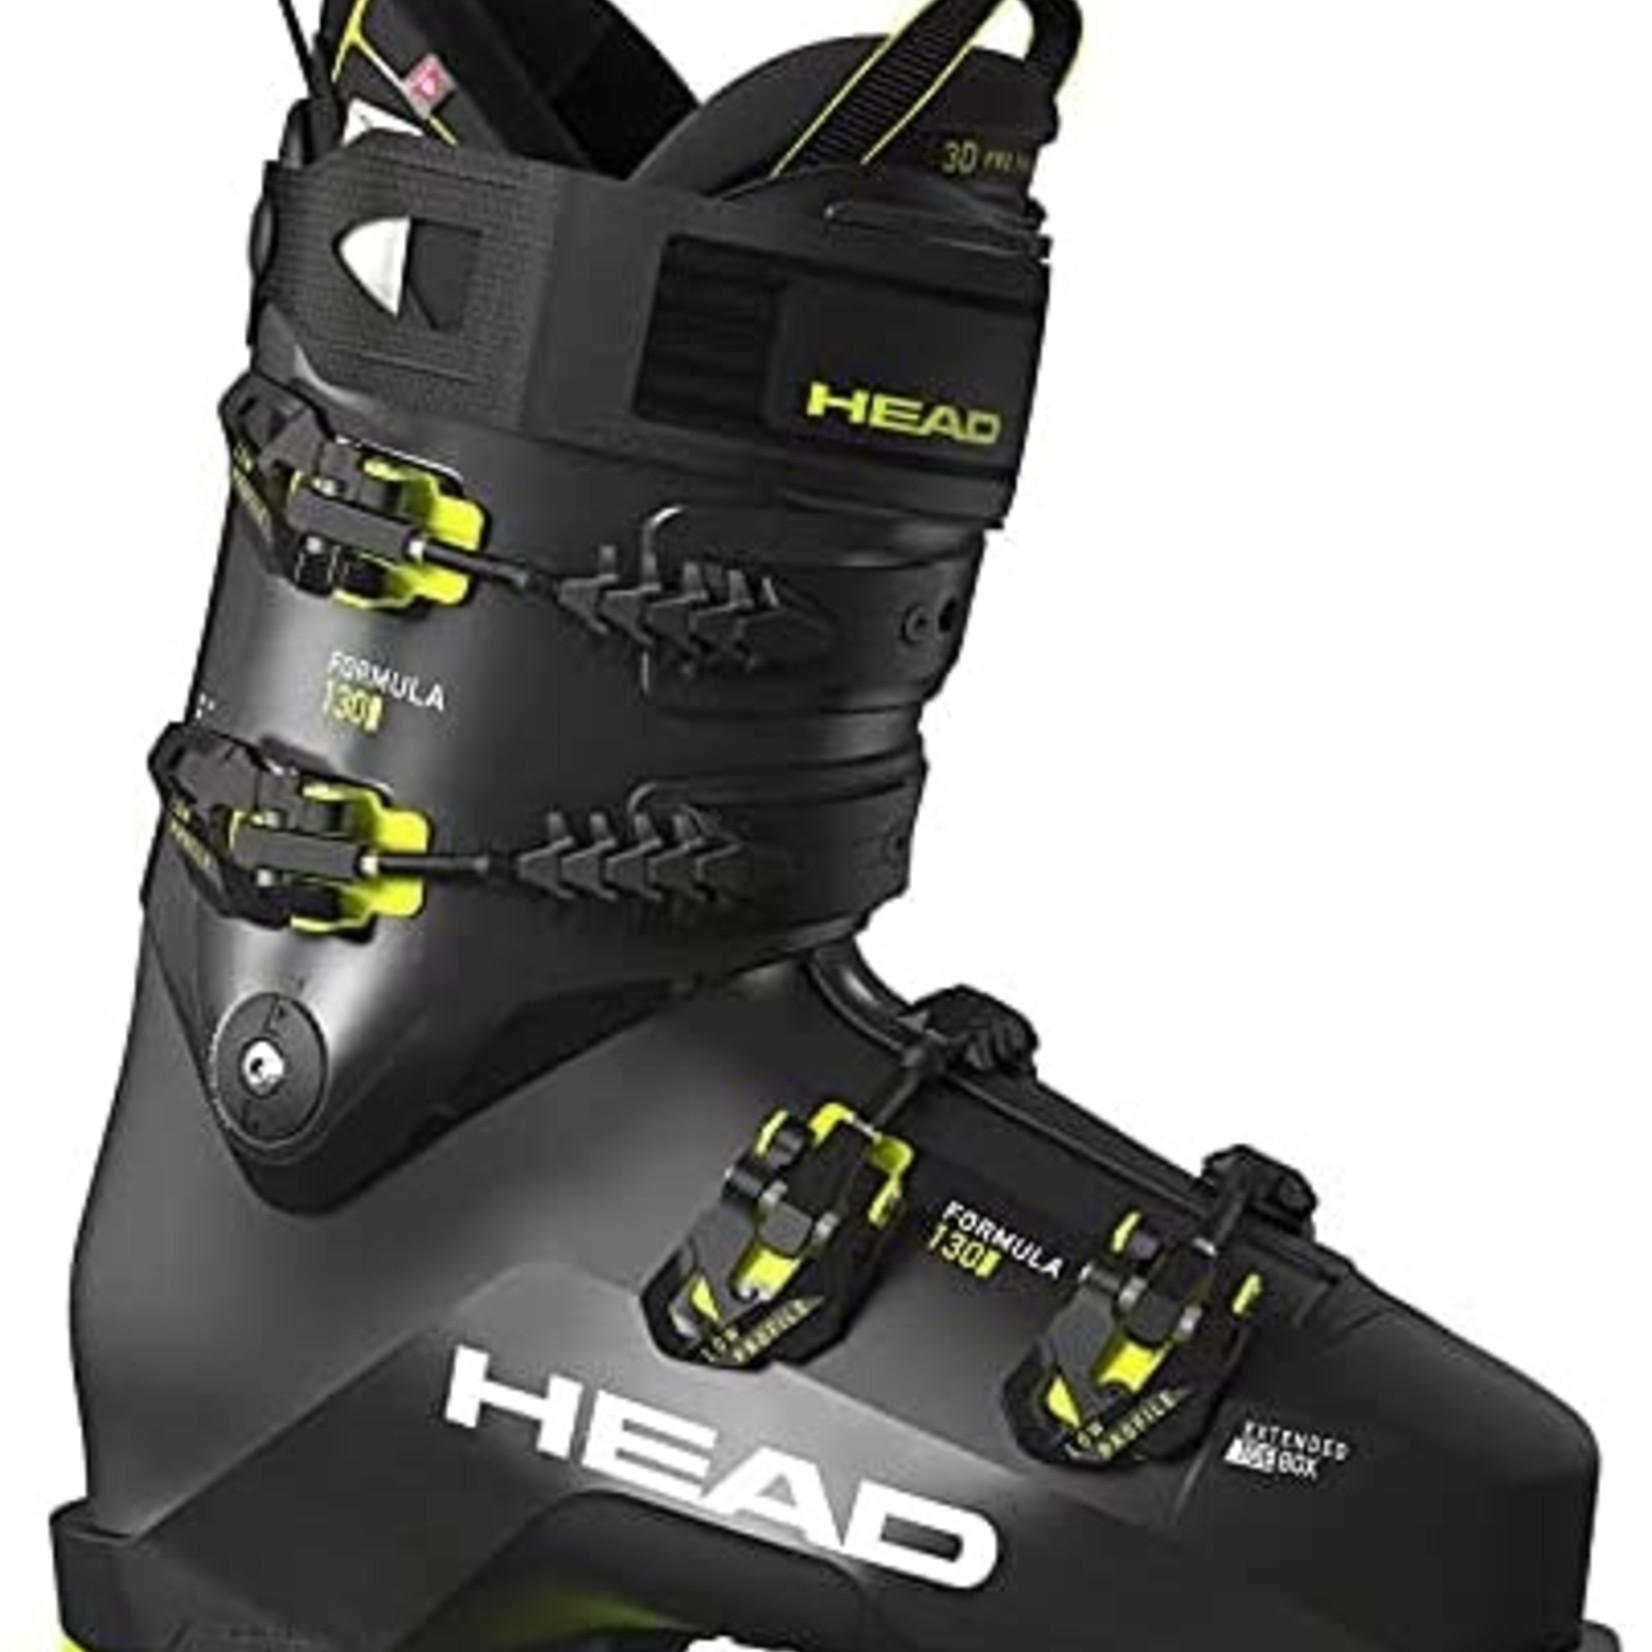 Head Head Rs Formula 130